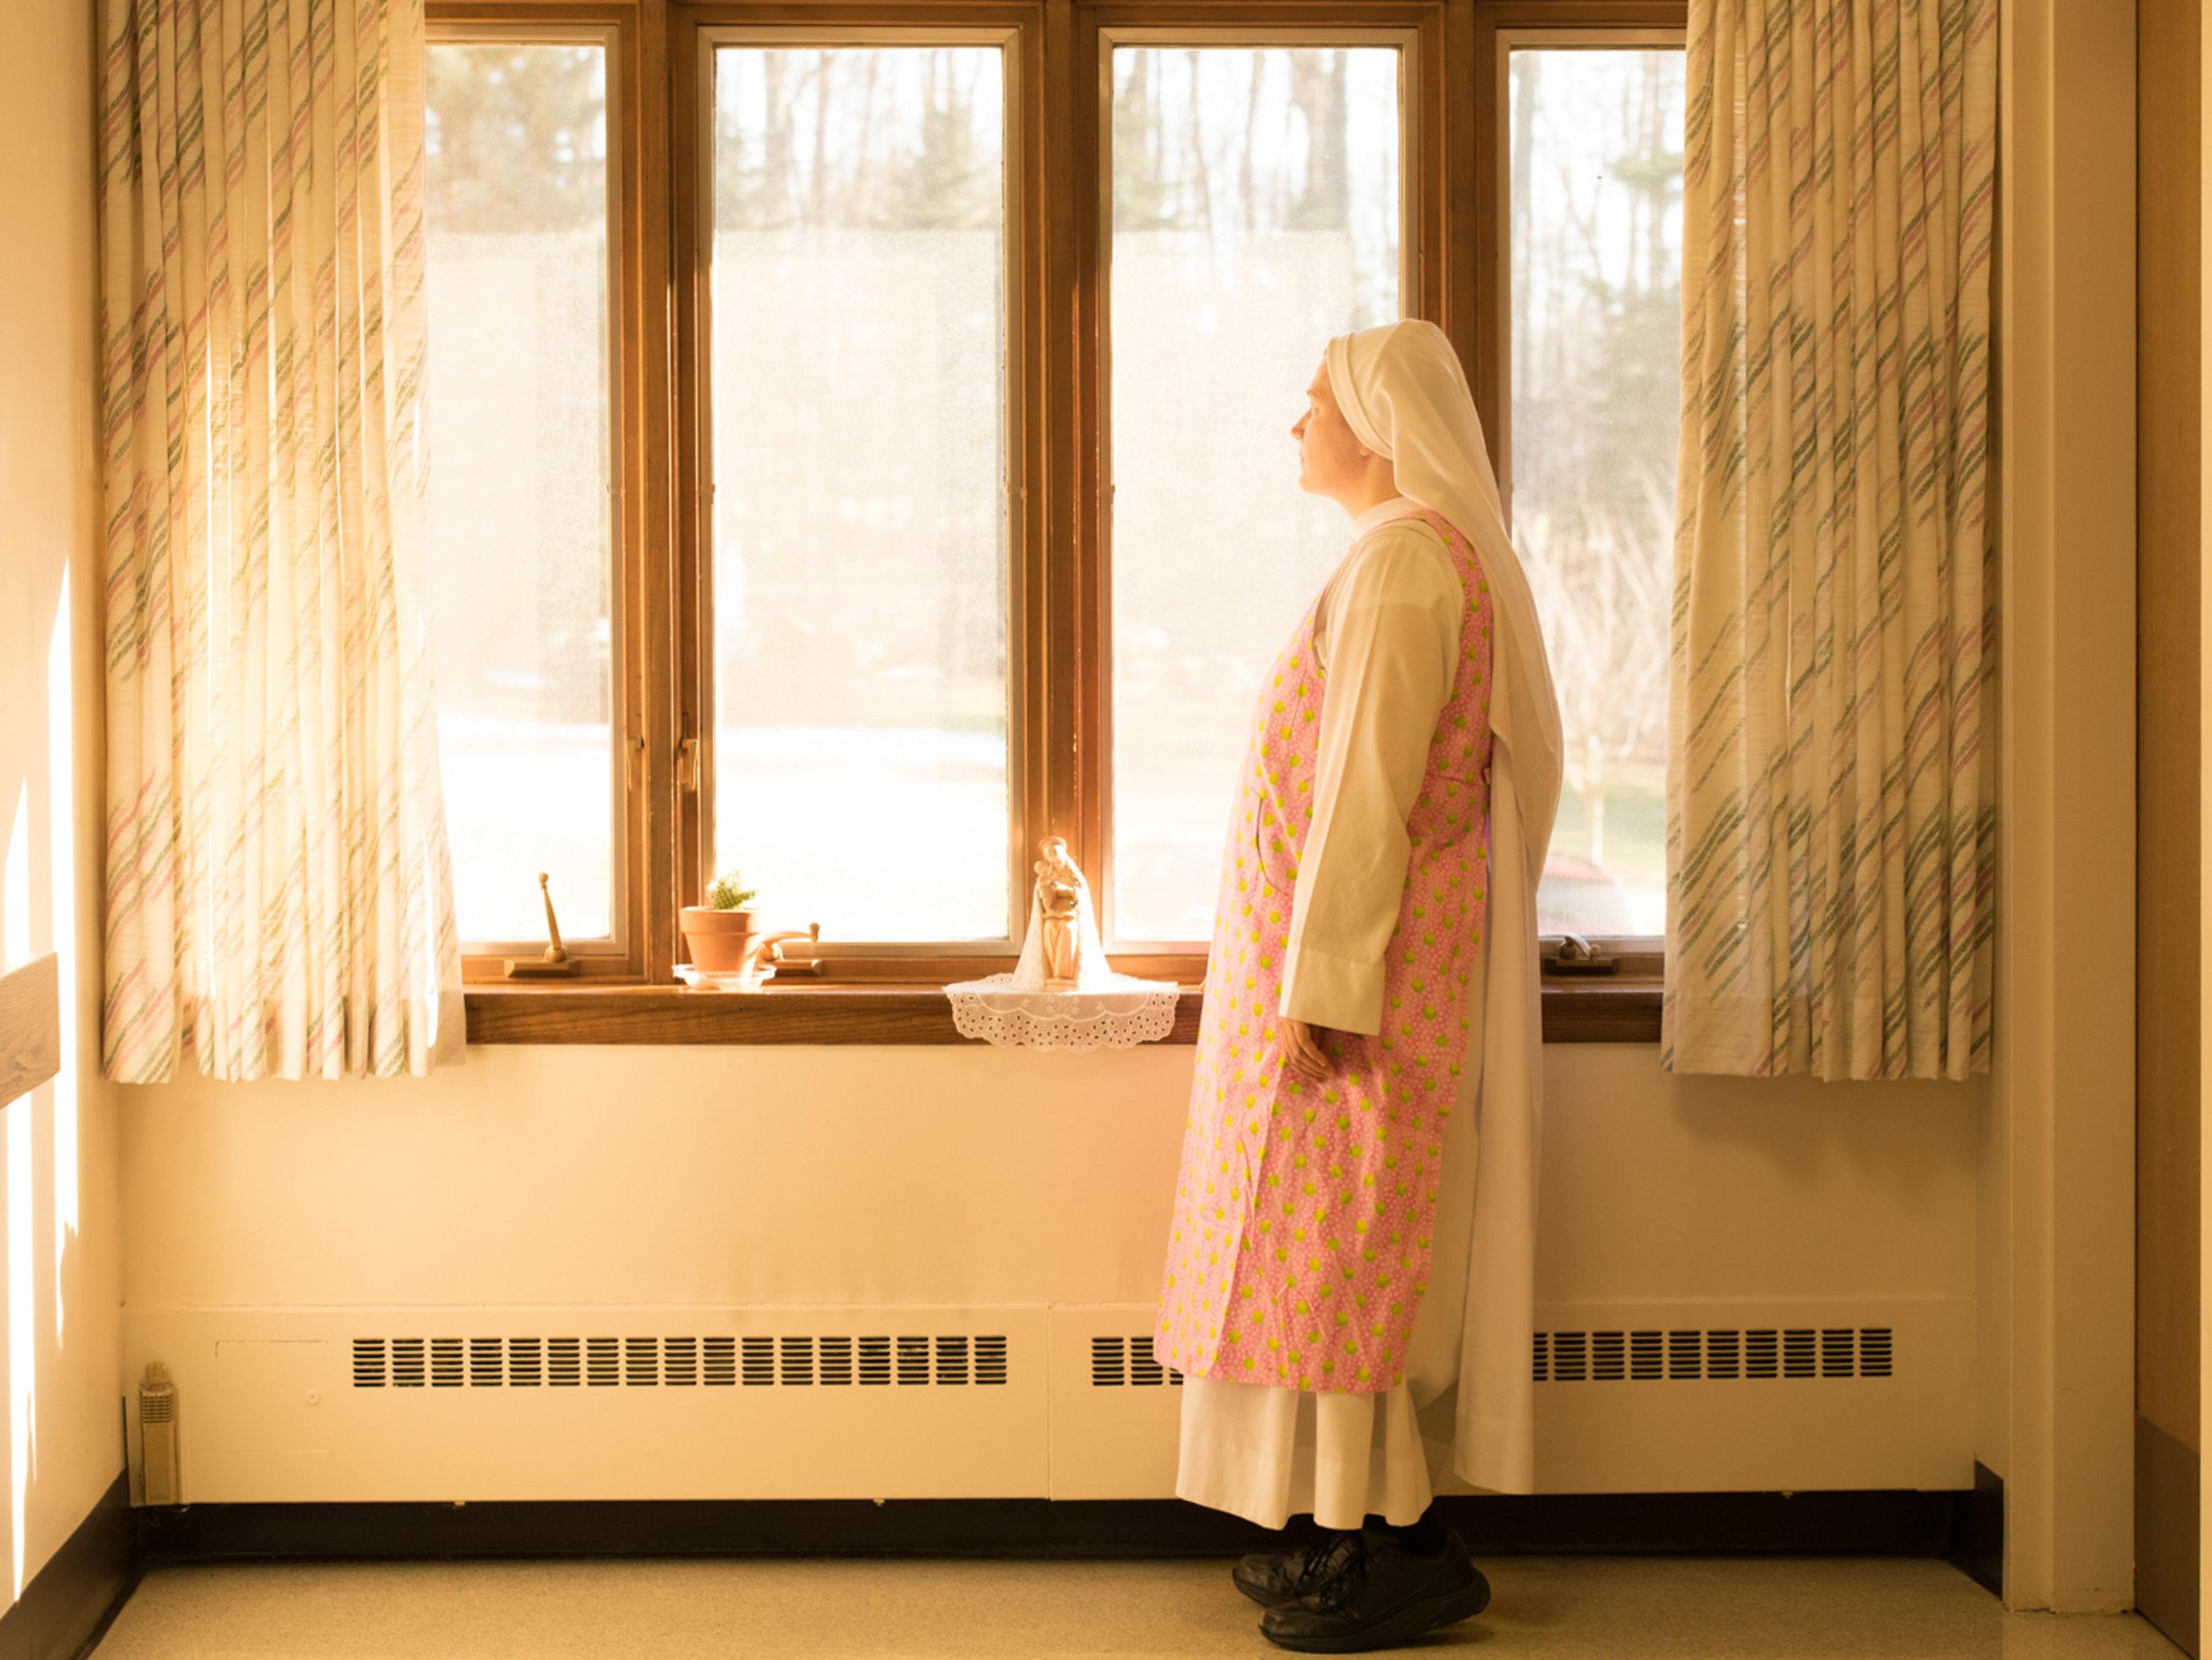 Sister Regina Marie in the light